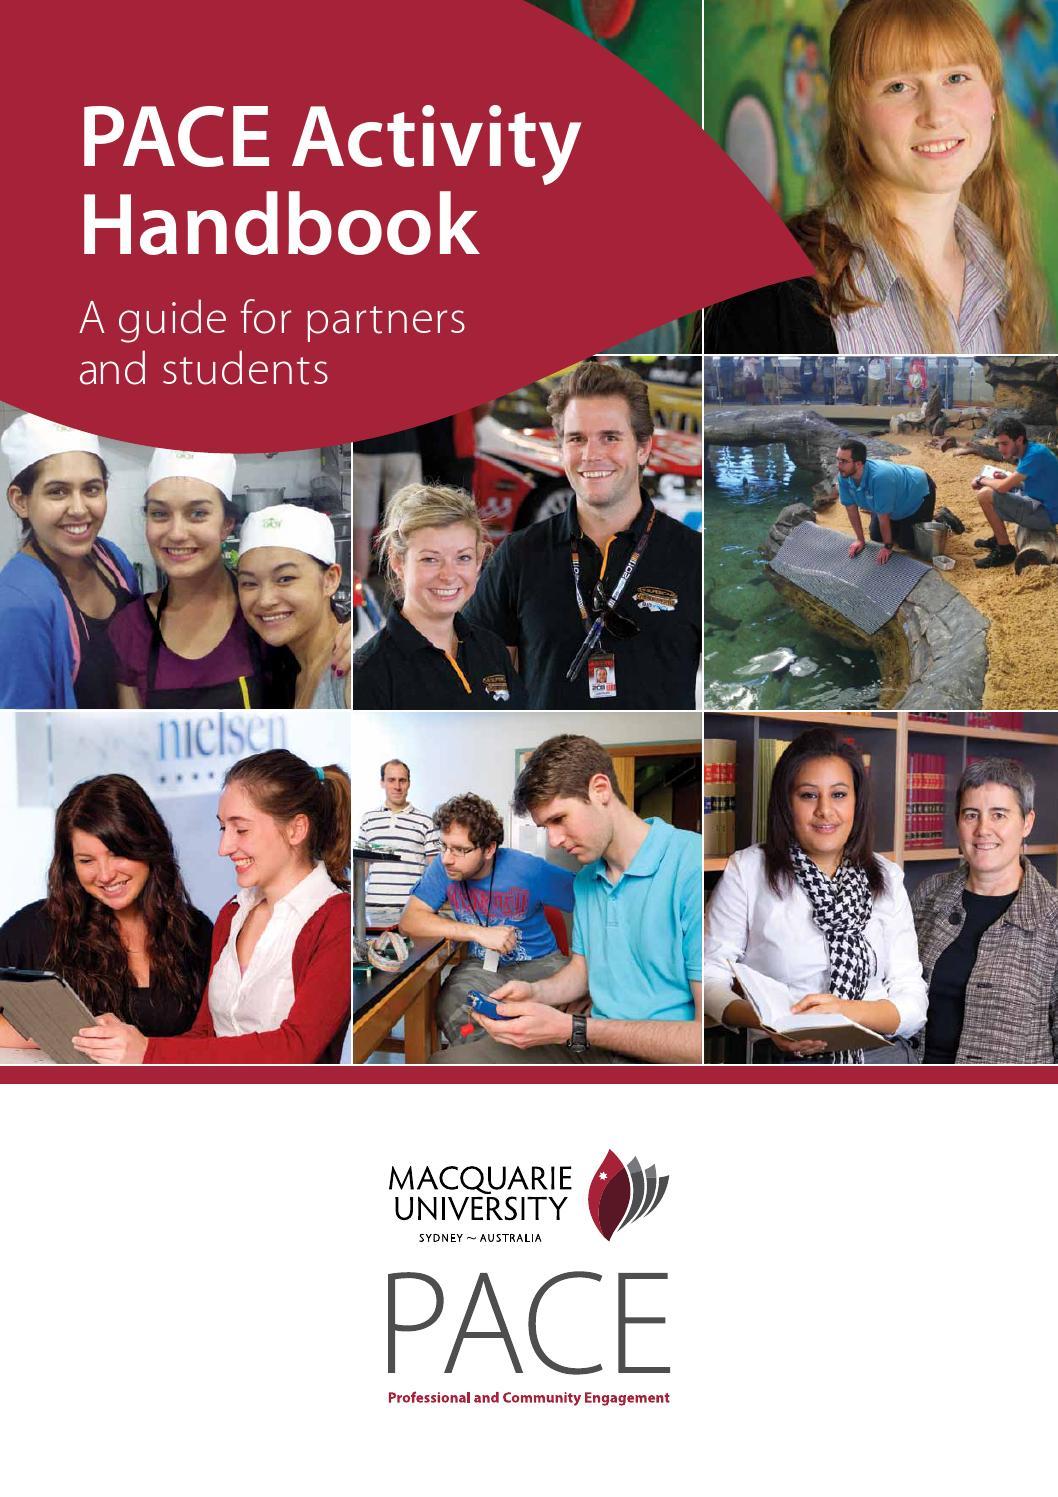 macquarie university student handbook